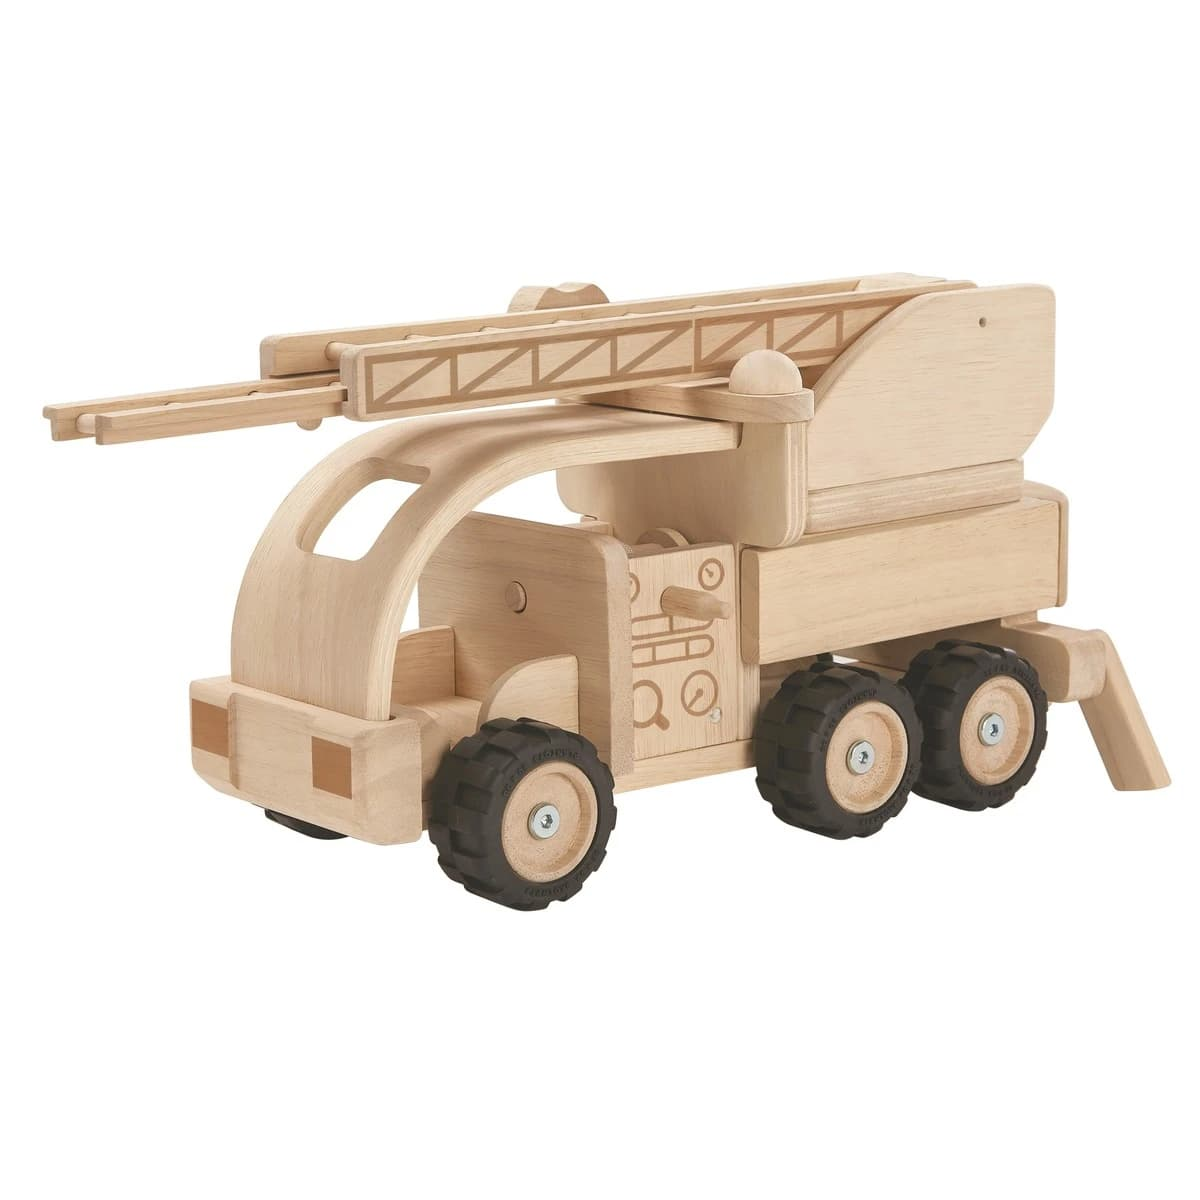 Plantoys Feuerwehrauto aus Holz